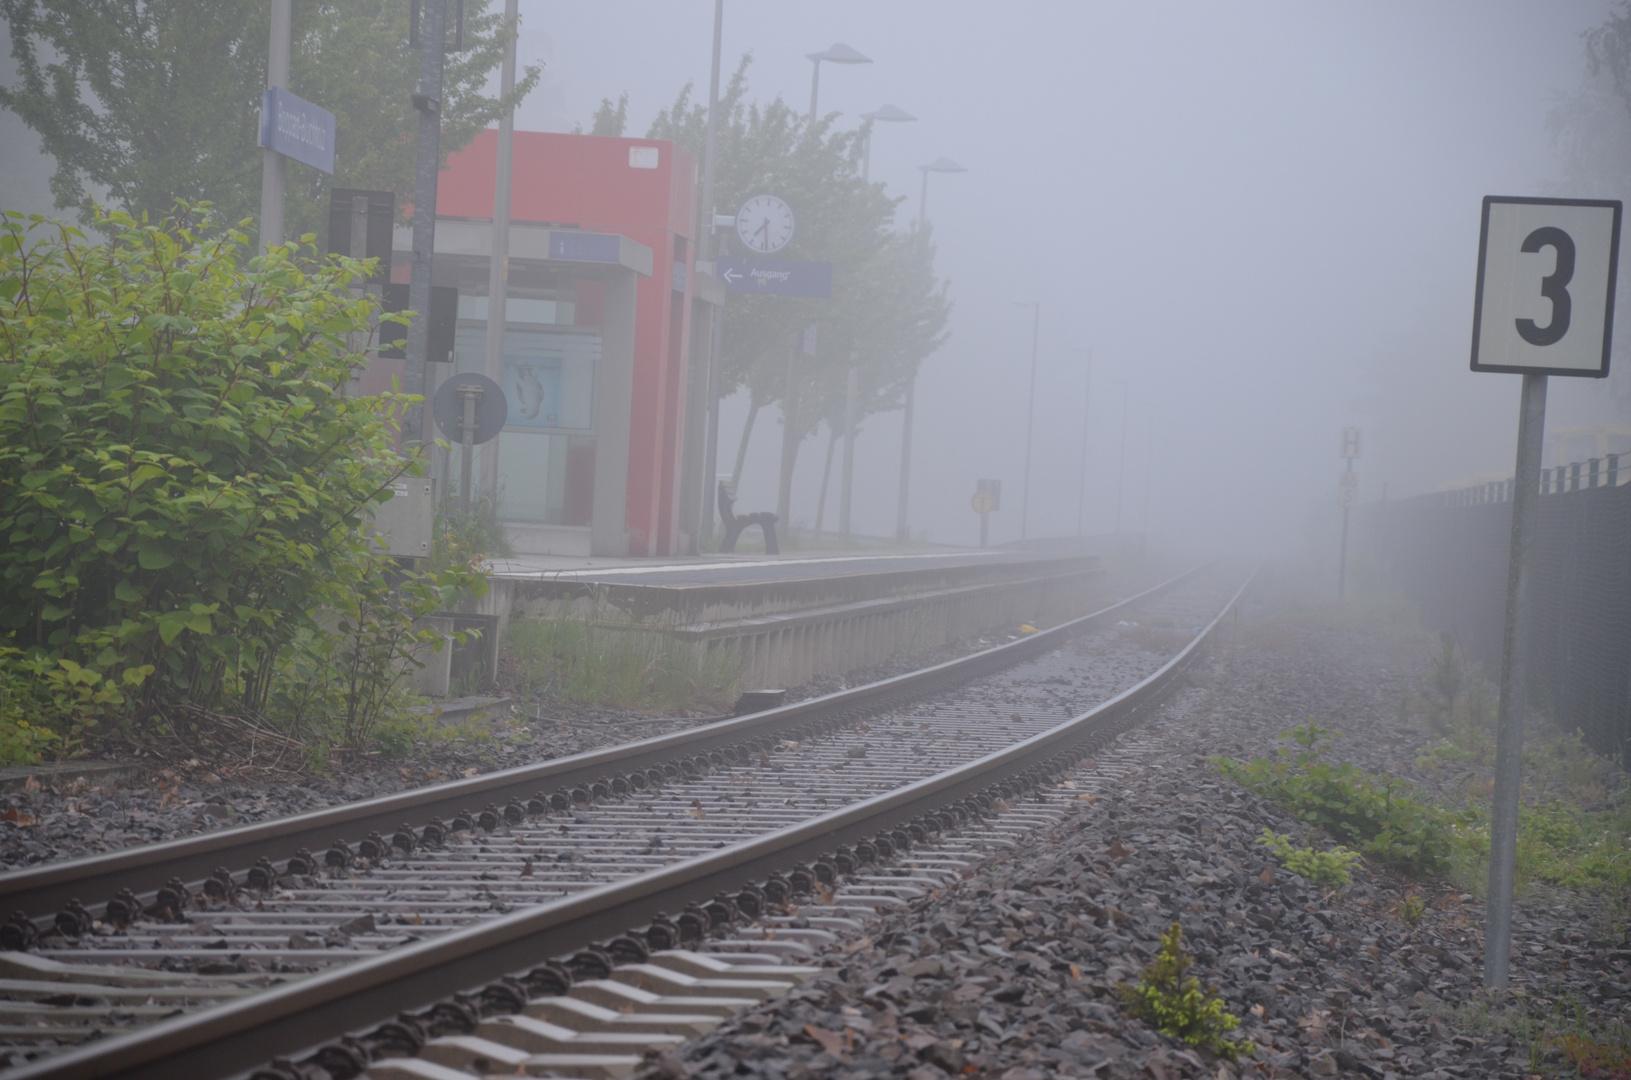 Railroad Station Boppard